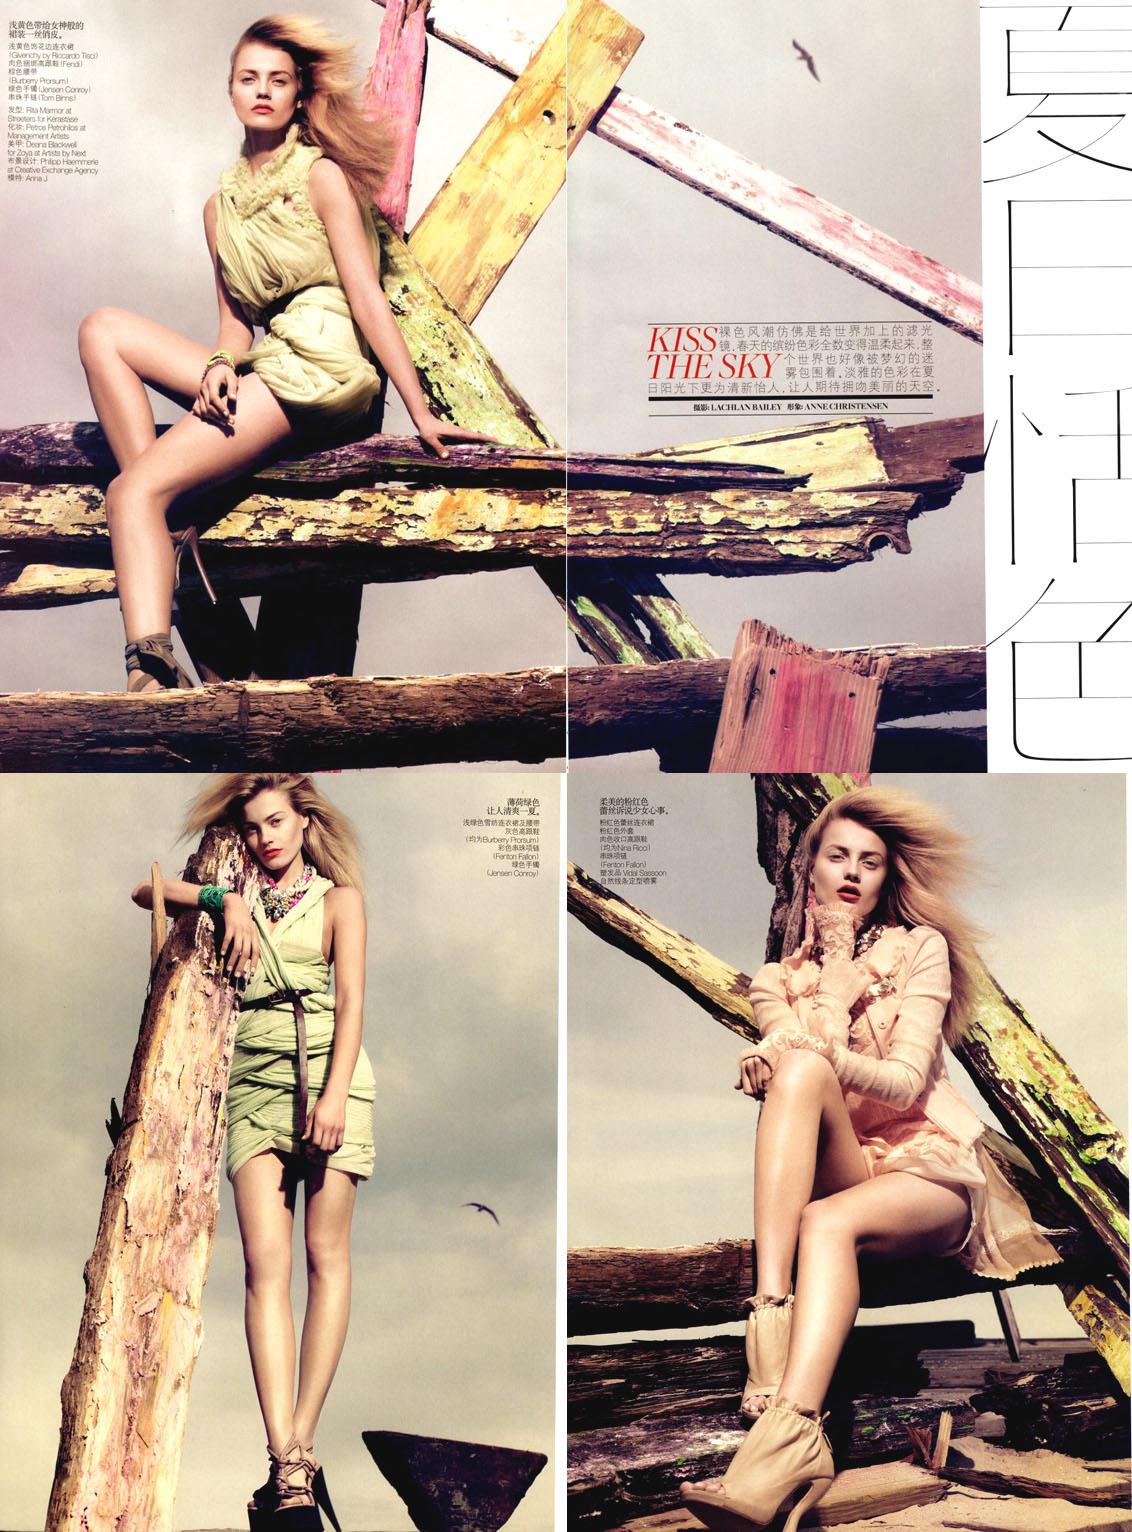 http://3.bp.blogspot.com/_twYmnhXVfP4/S_jdofbXmoI/AAAAAAAAJ2w/gjEJURzPKMU/s1600/editorial6.jpg